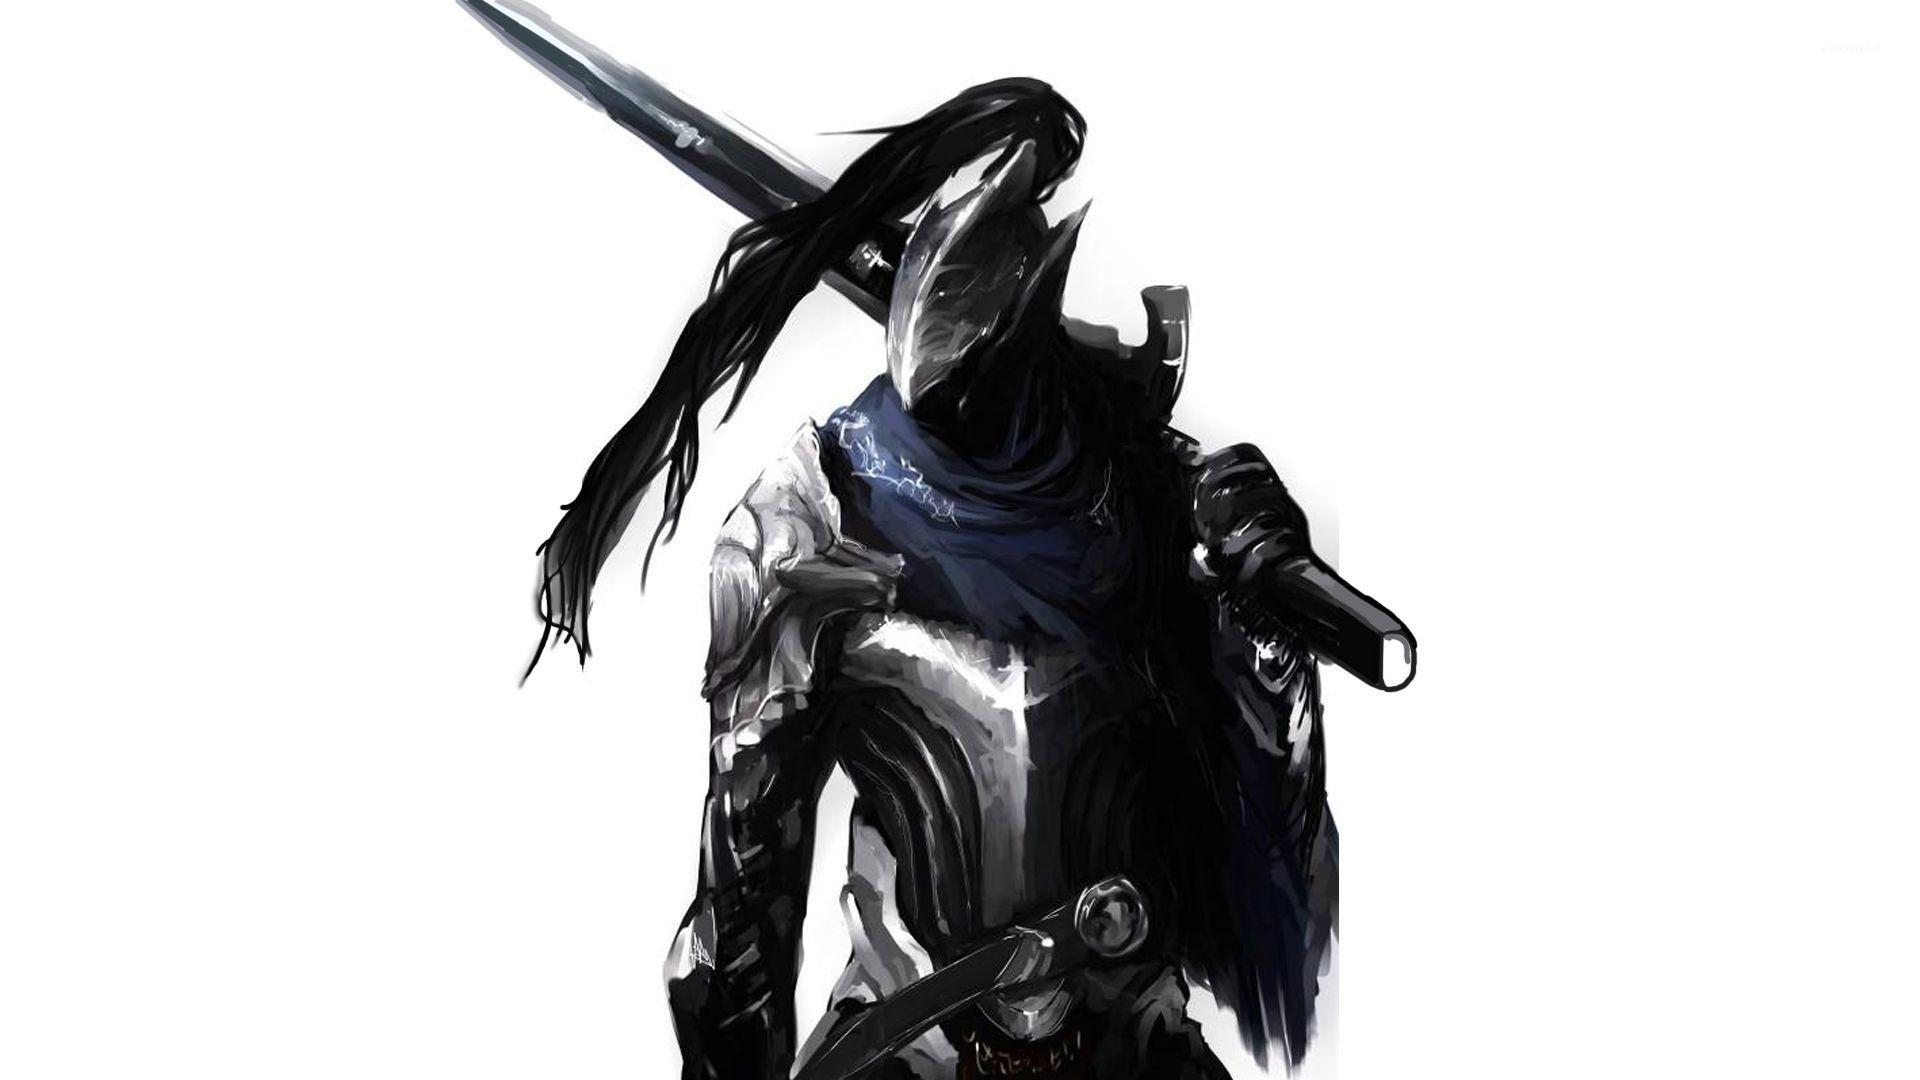 Dark Souls 3 Wallpaper Hd 1080p